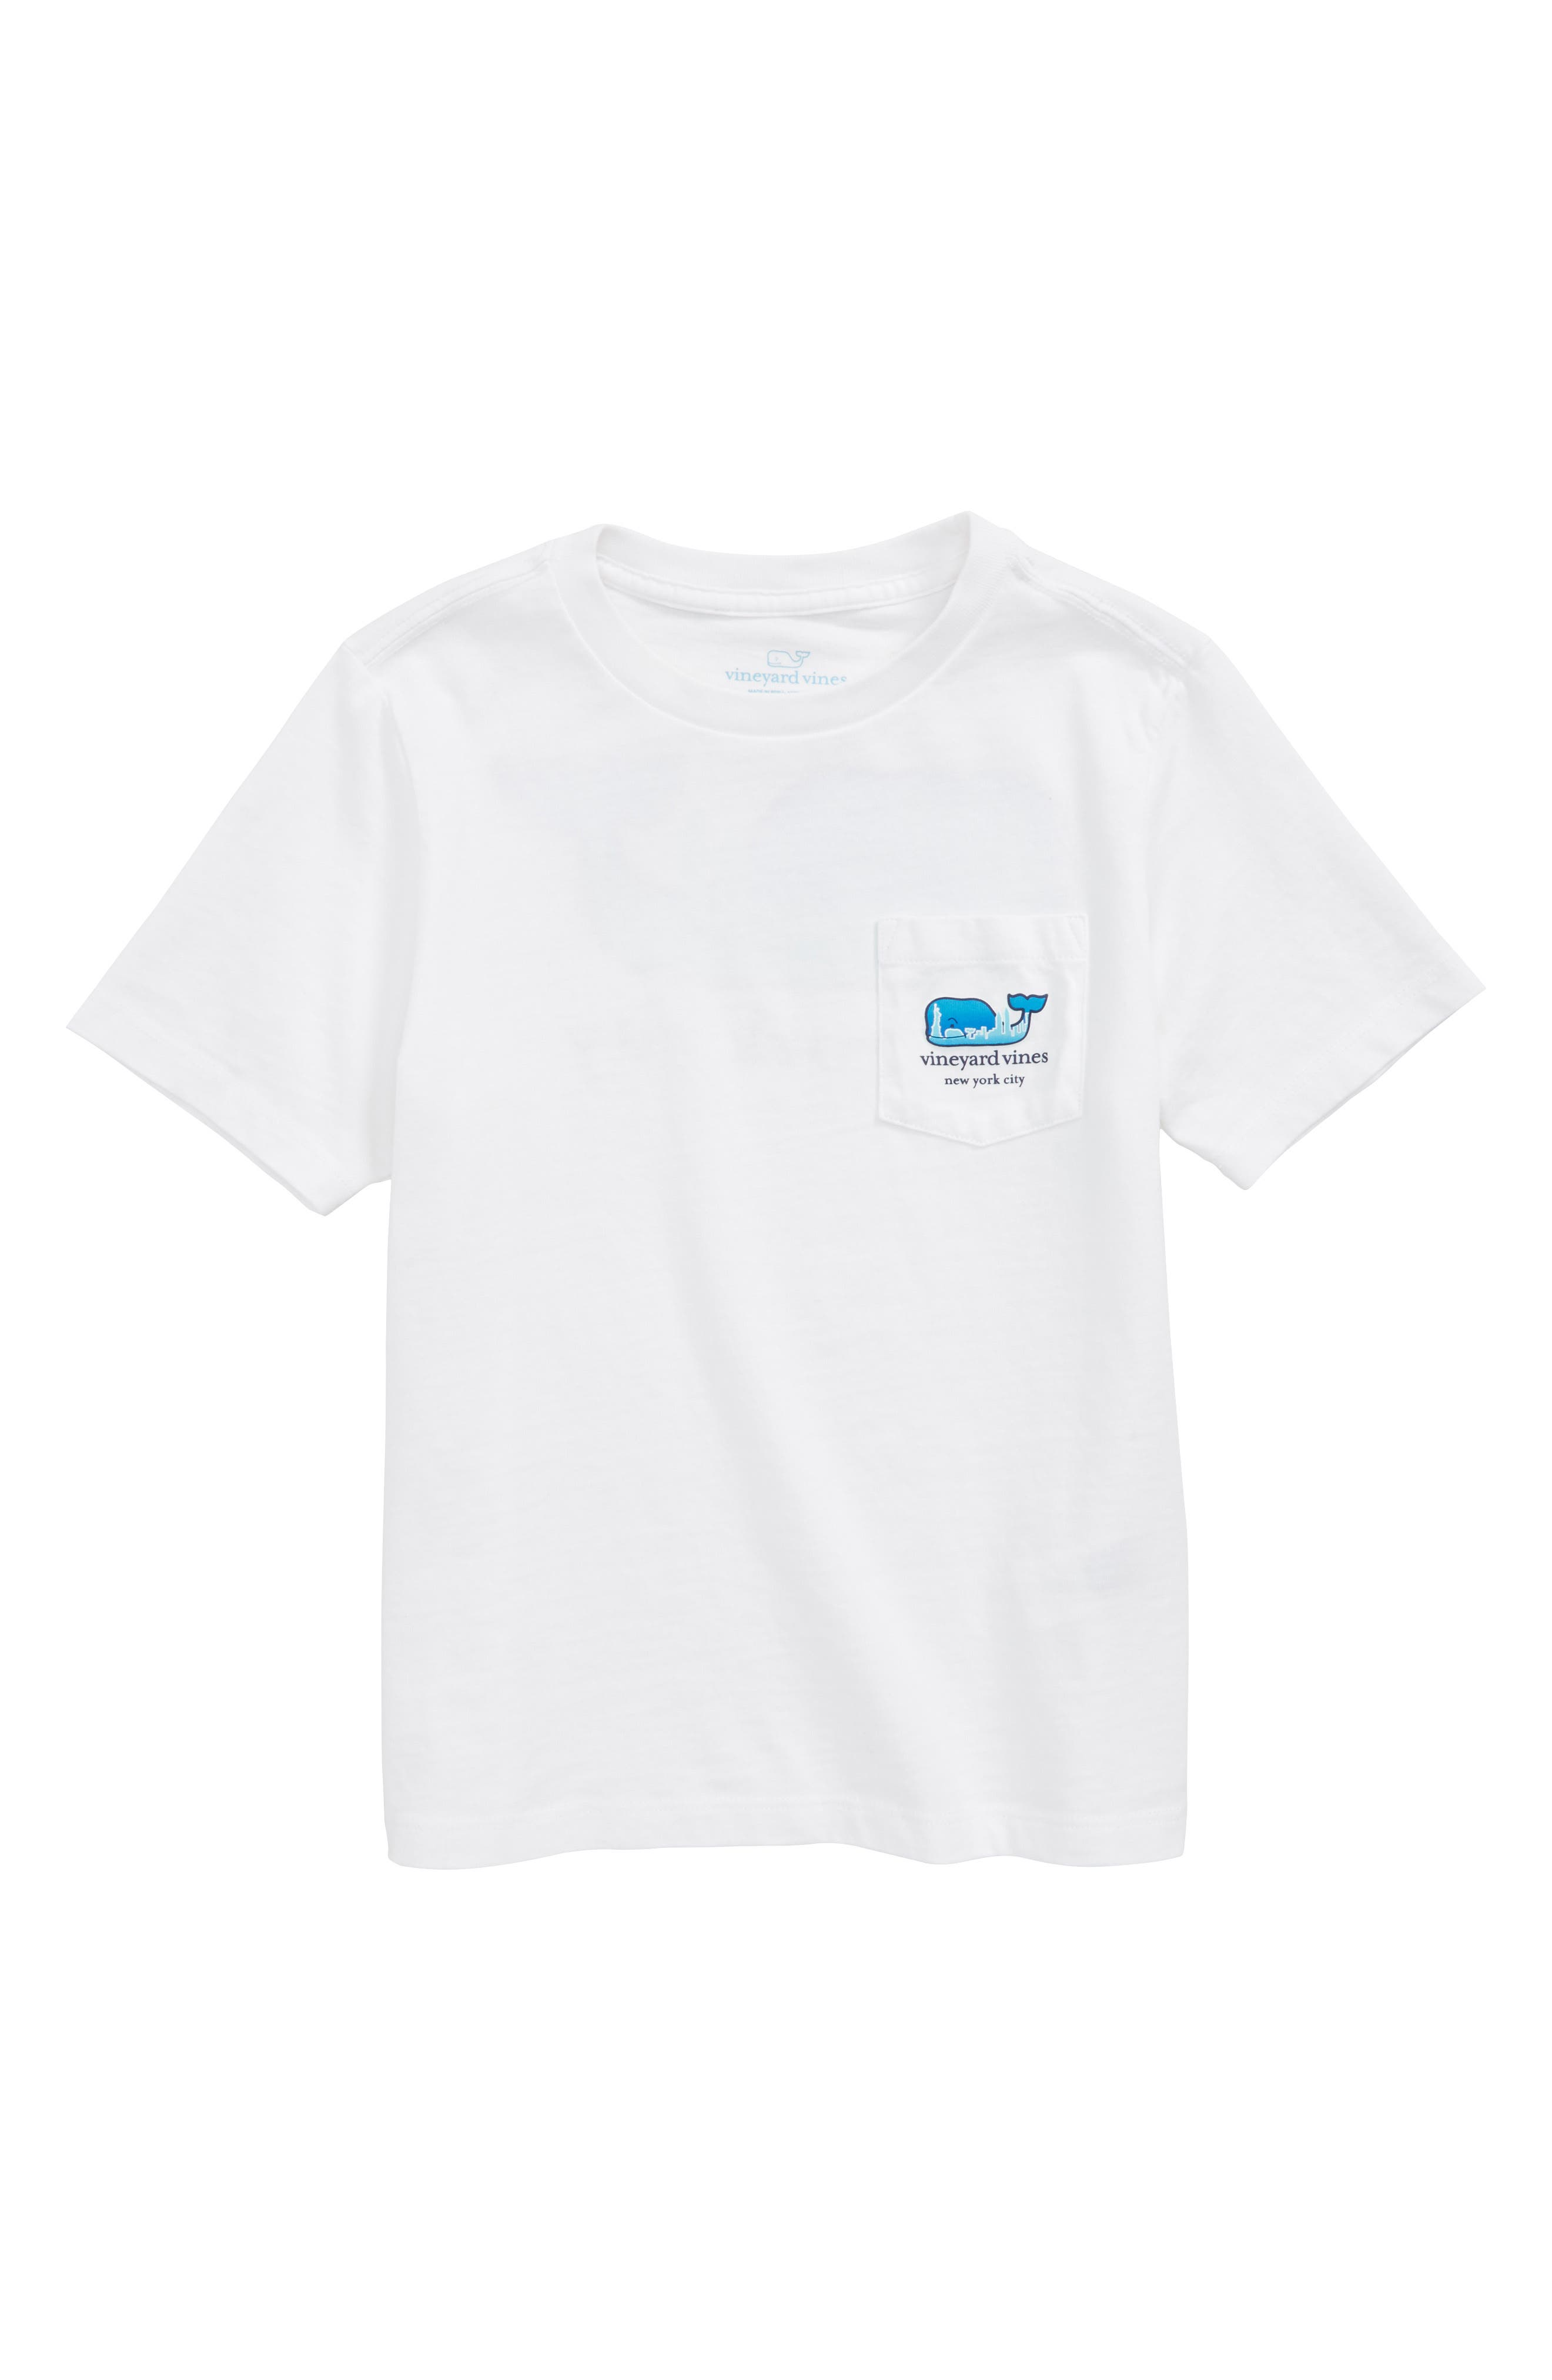 New York City Whale Pocket T-Shirt,                             Main thumbnail 1, color,                             White Cap